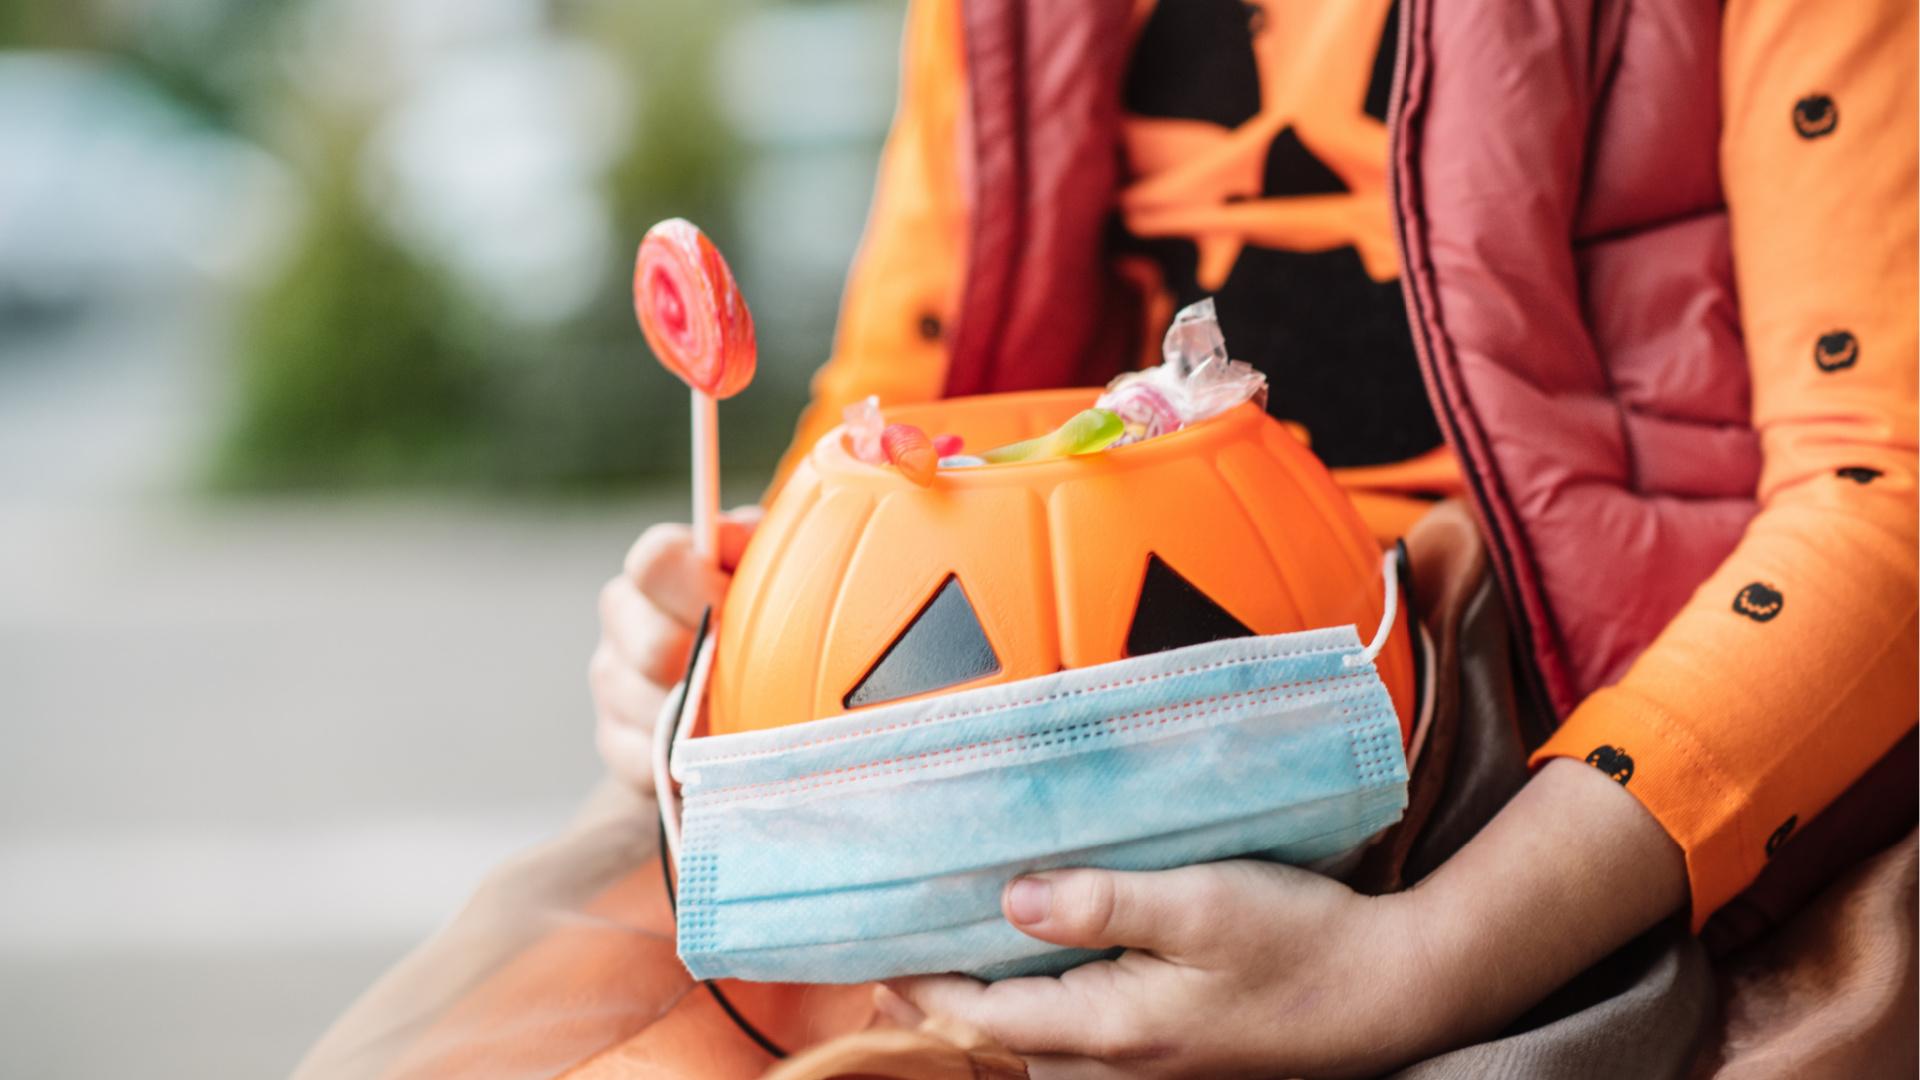 Cbs 2020 Halloween CBS 42 | CDC ranks Halloween activities by COVID 19 risk: No trick